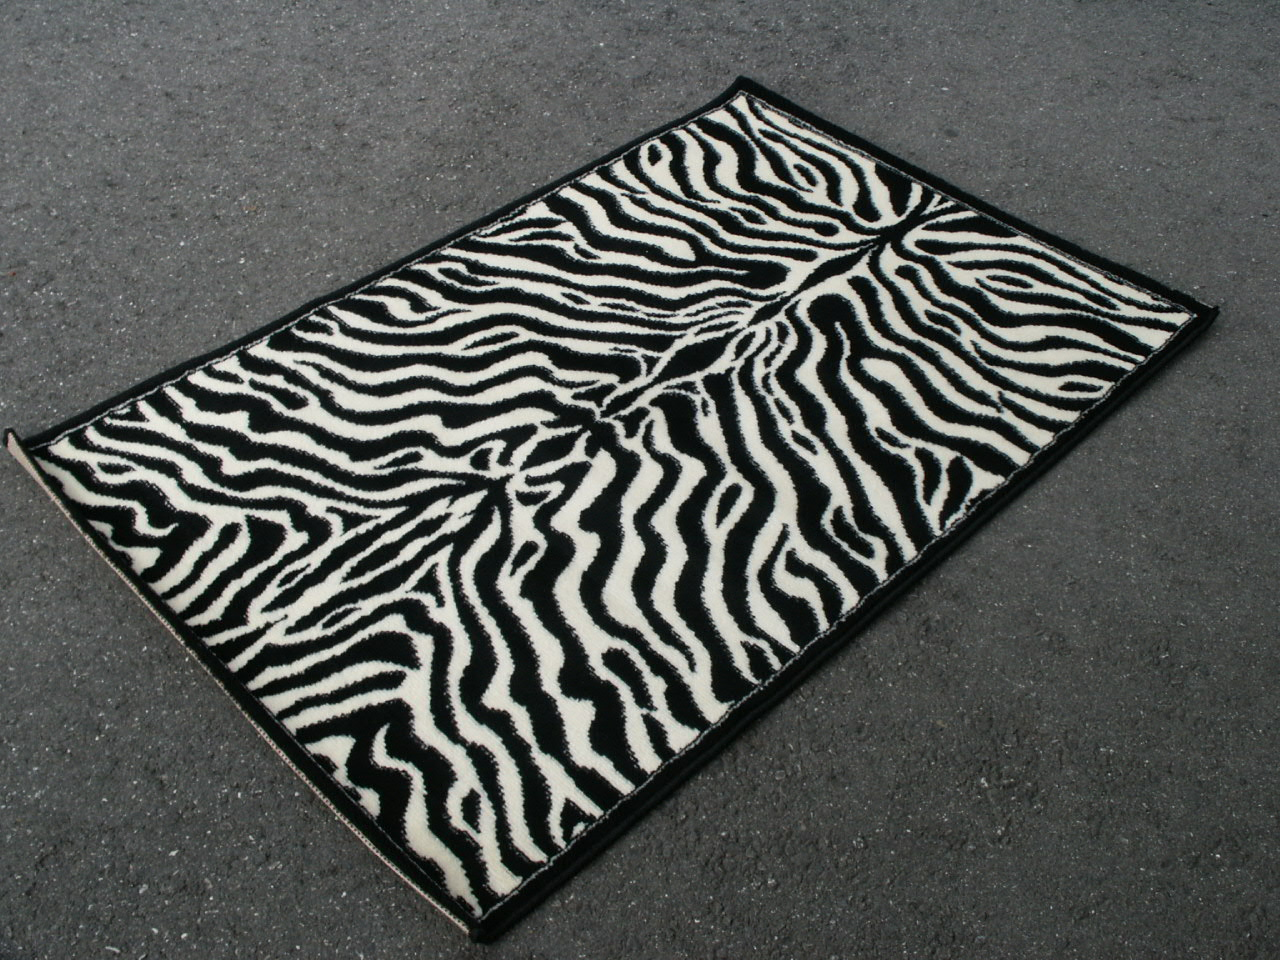 Zebra Teppich  sylviatownsendwarnercom